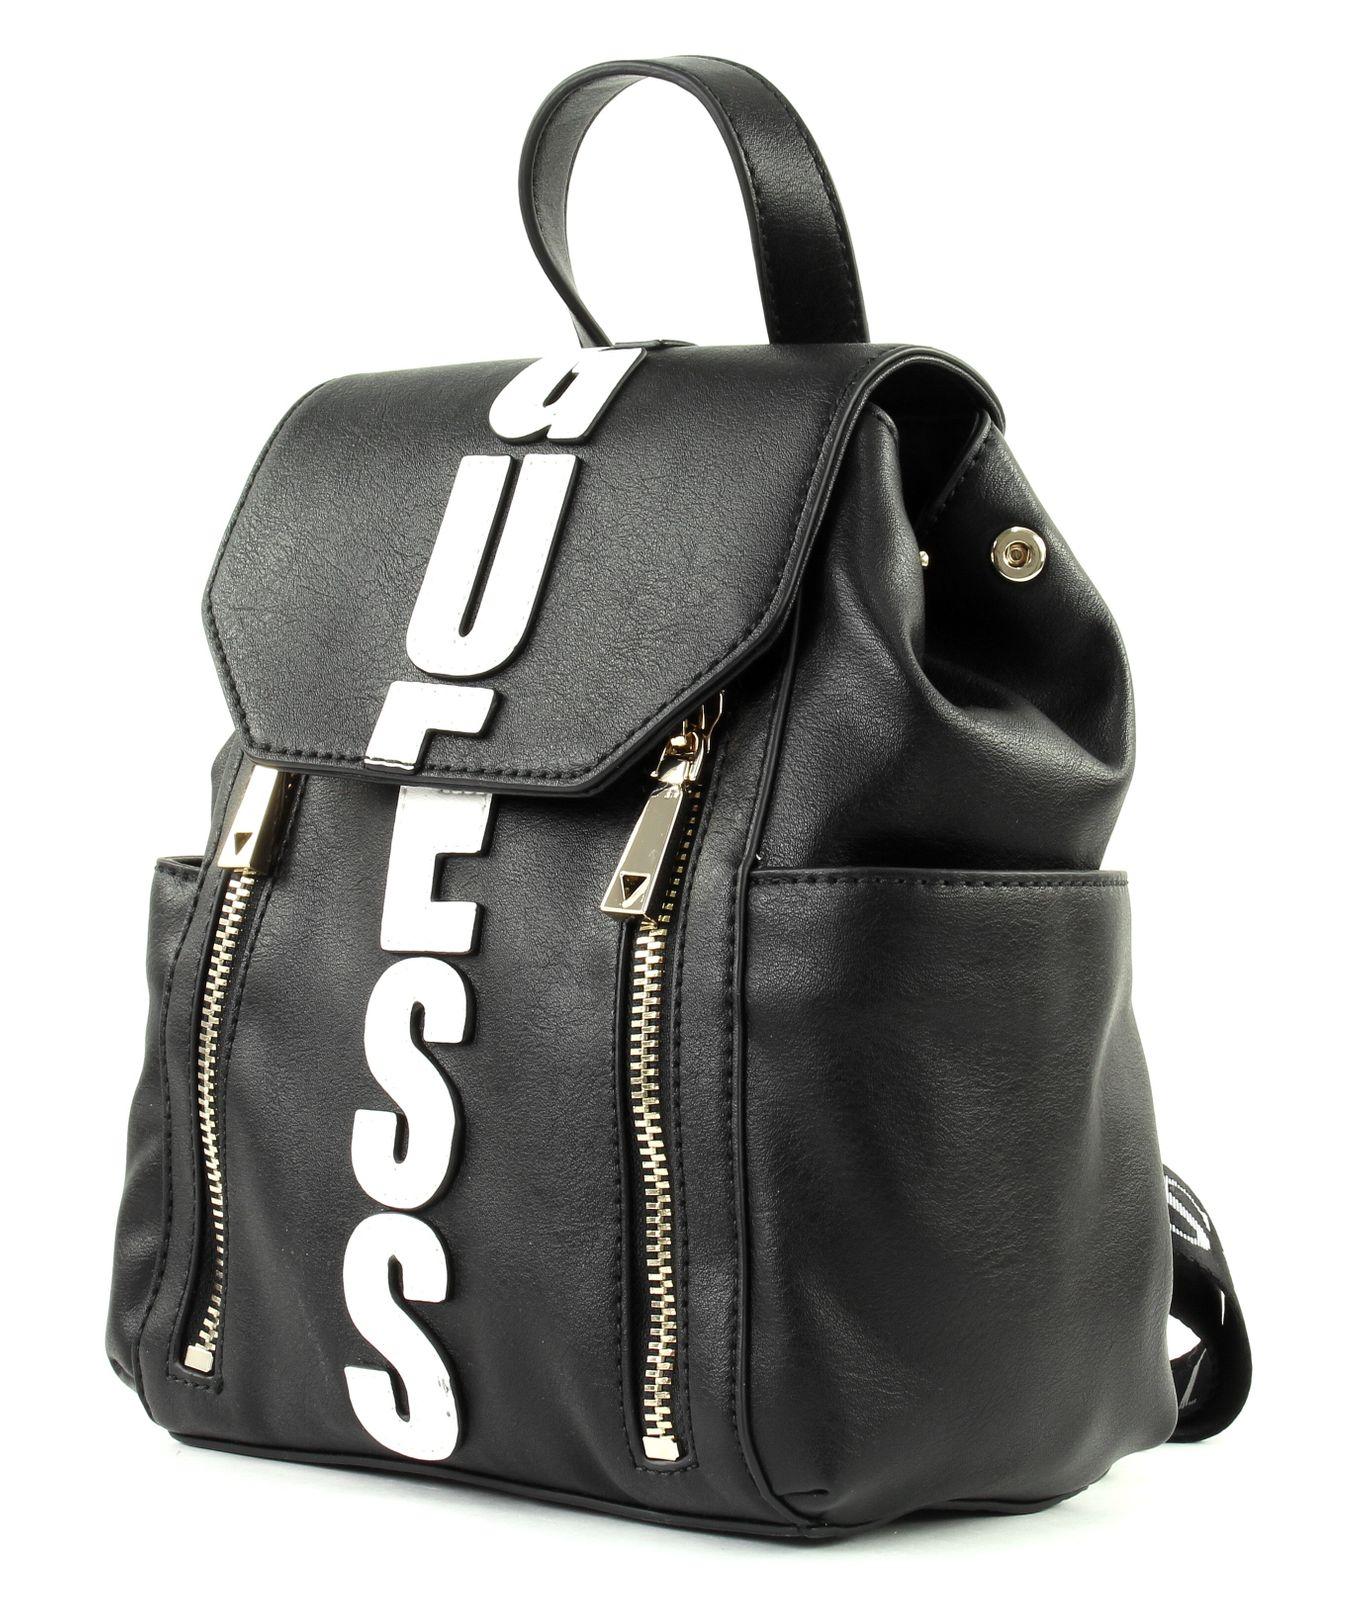 ca5f823e4a ... CloseGUESS Urban Sport Small Backpack Black   105